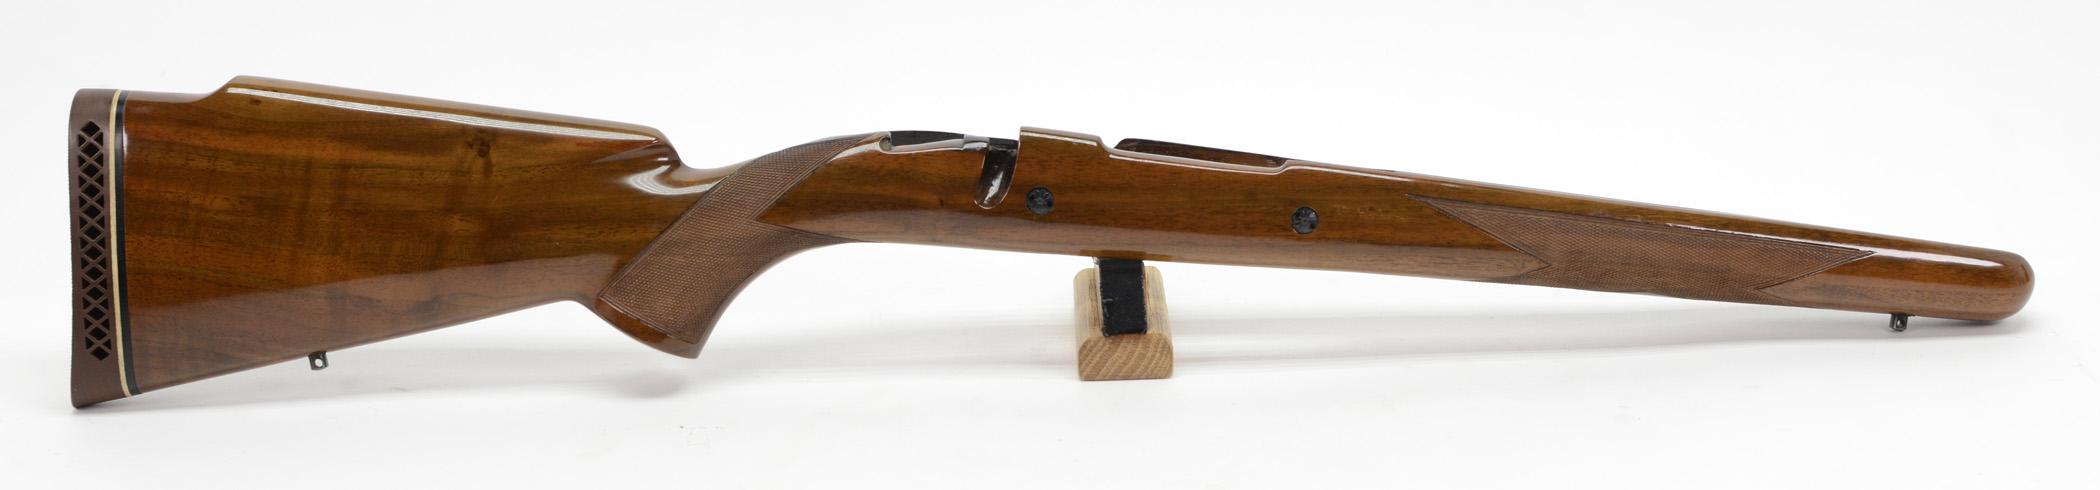 Browning Safari Magnum Stock